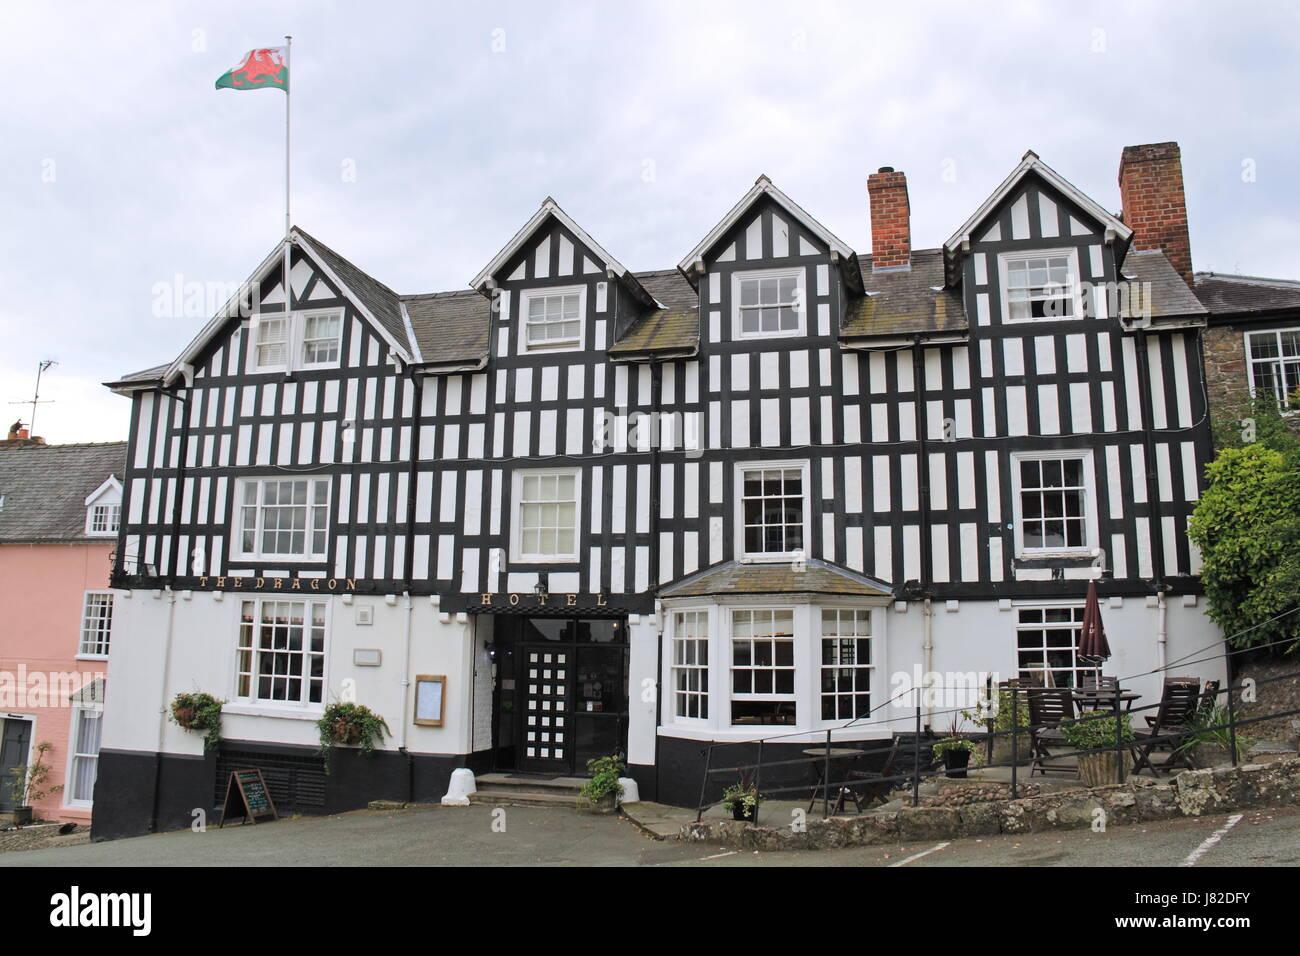 Dragon Hotel, Montgomery, Montgomeryshire, Powys, Wales, Great Britain, United Kingdom, UK, Europe - Stock Image